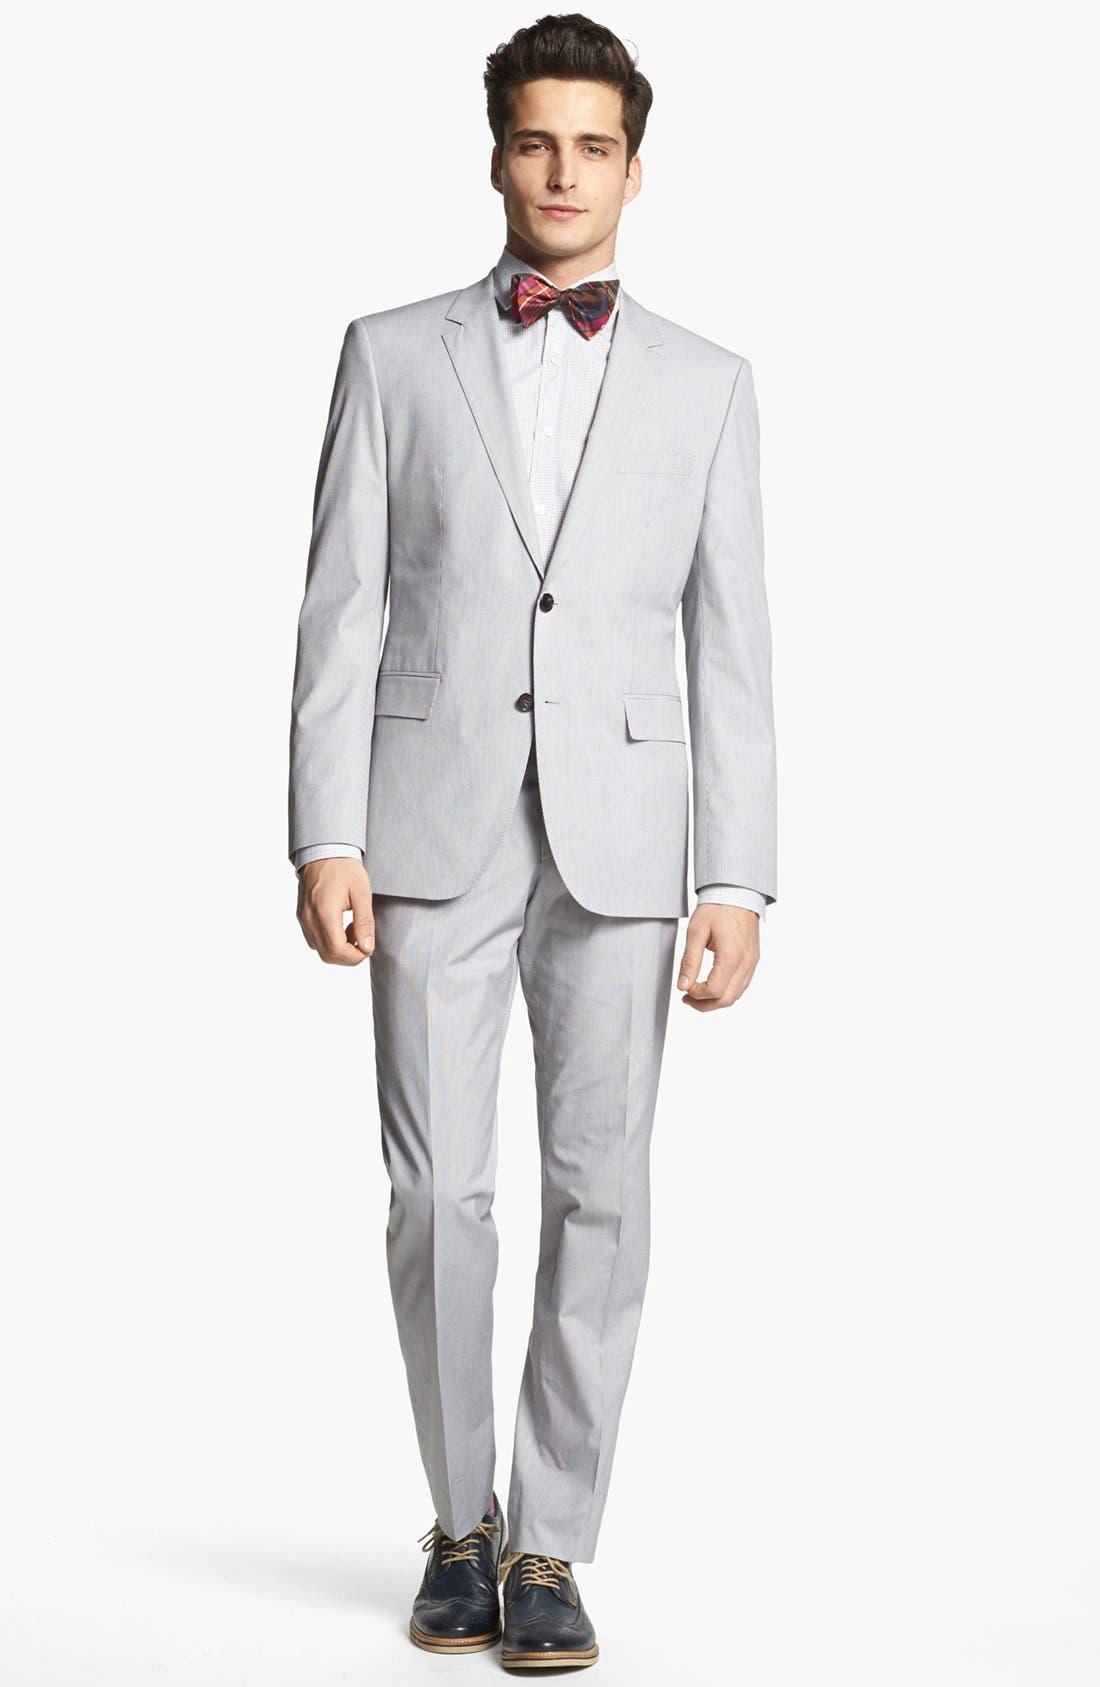 Alternate Image 1 Selected - BOSS HUGO BOSS 'James/Sharp' Trim Fit Stripe Suit